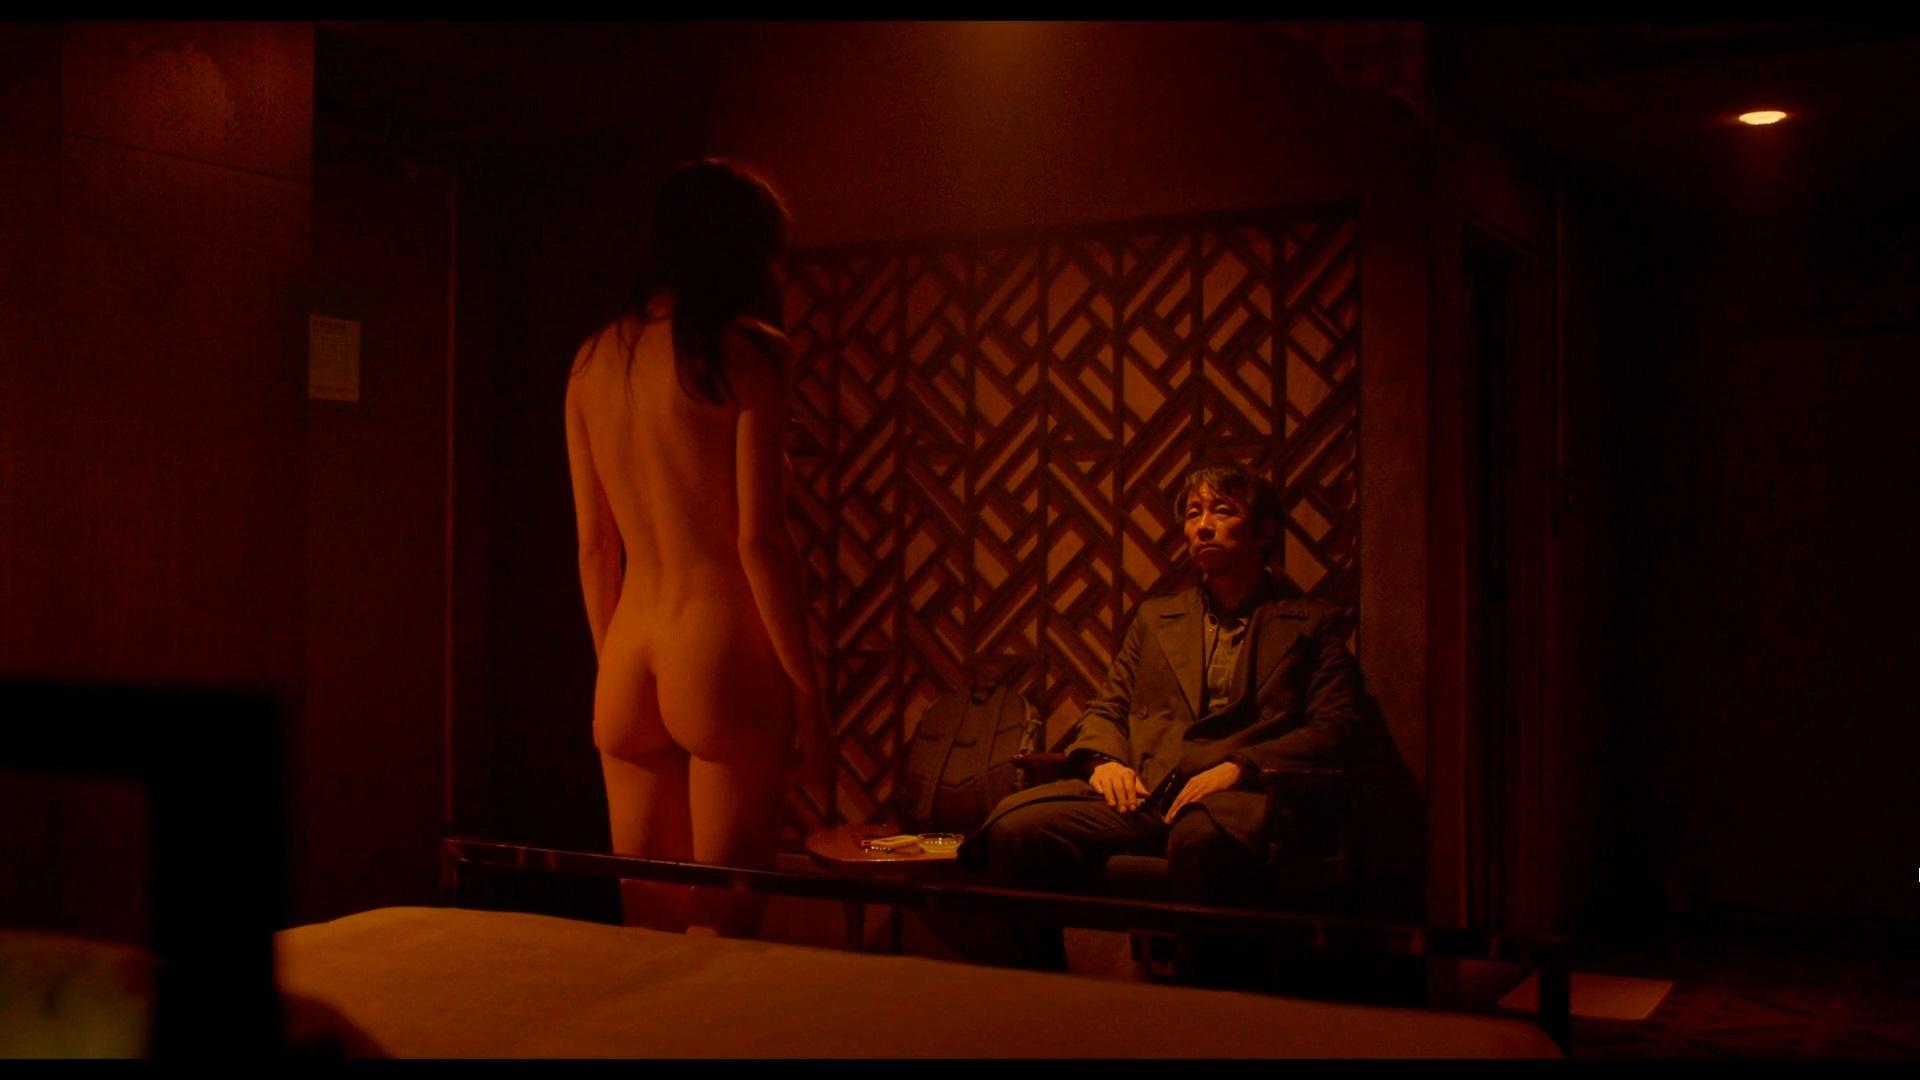 Alexandra Daddario - Lost Girls and Love Hotels (2020) 1080p WEBRip 4-0-00-54-985.jpg